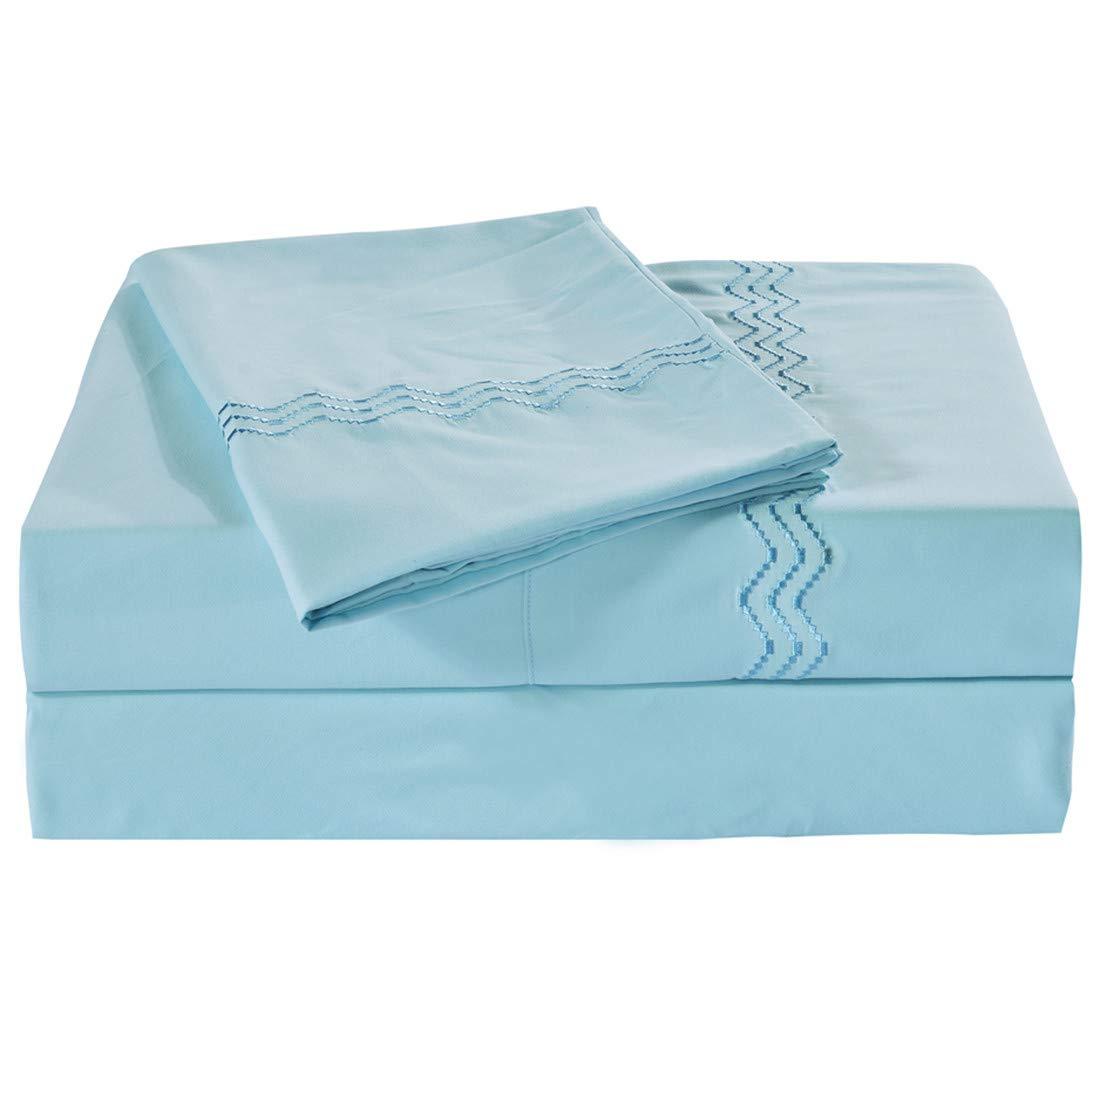 Vonty Embroidered Brushed Microfiber 1500 Thread Count Bed Sheet Set, Deep Pockets, Wrinkle & Fade Resistant 4pcs Sheet Sets (Queen,Sky Blue)